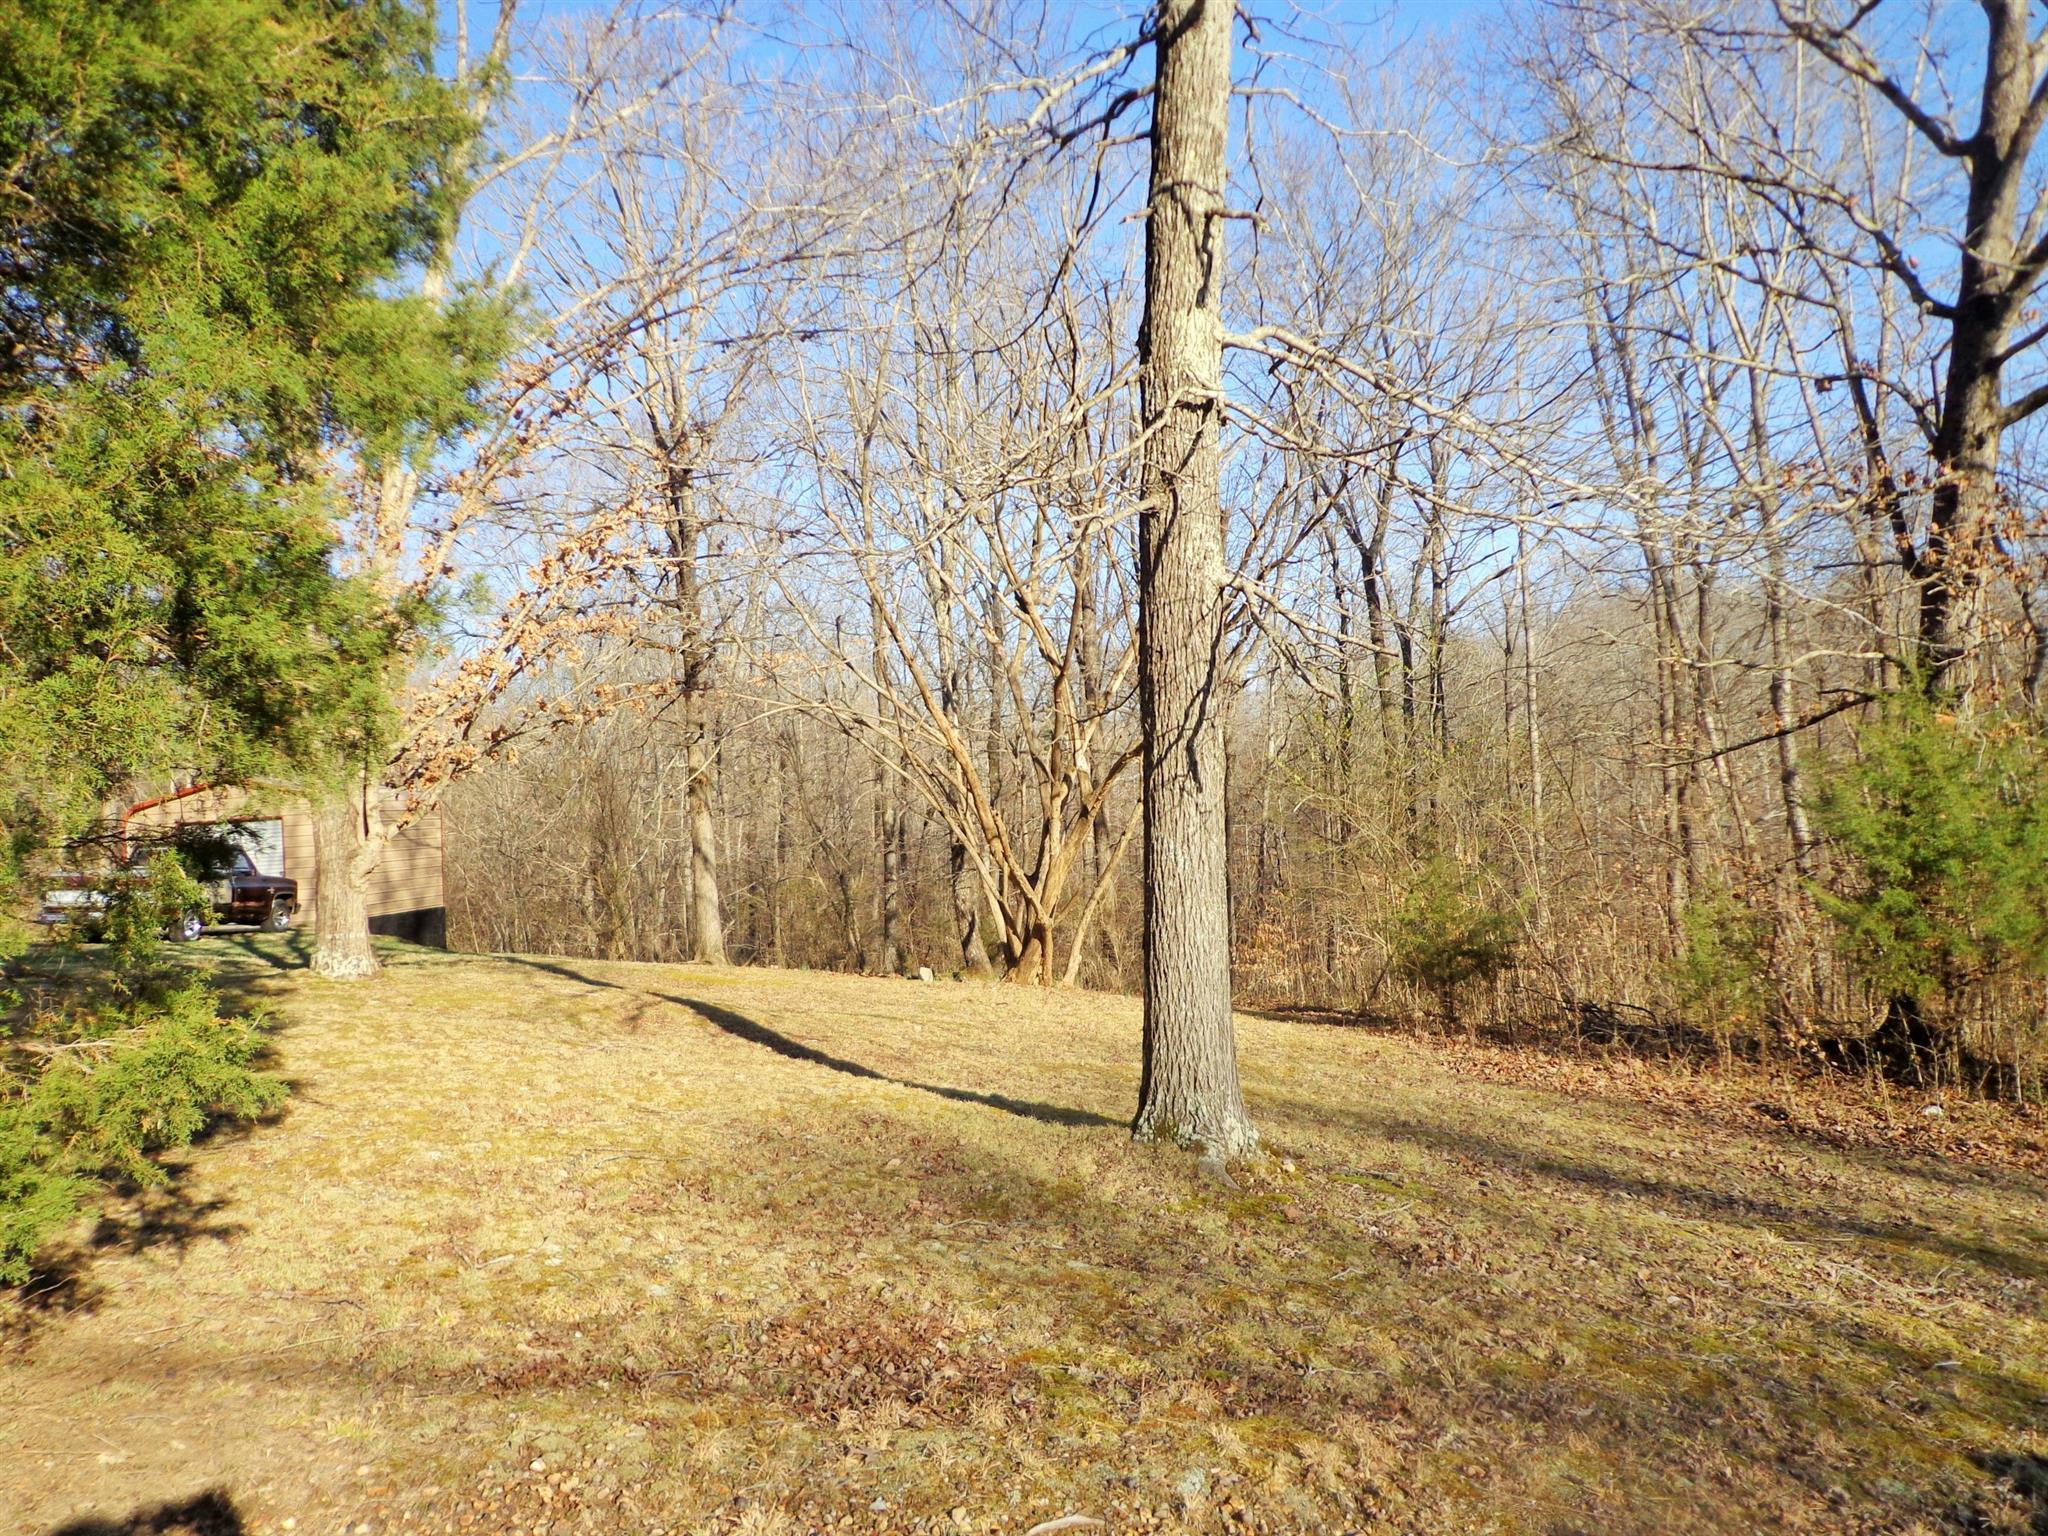 227 Washington Cir, Waverly, TN 37185 - Waverly, TN real estate listing